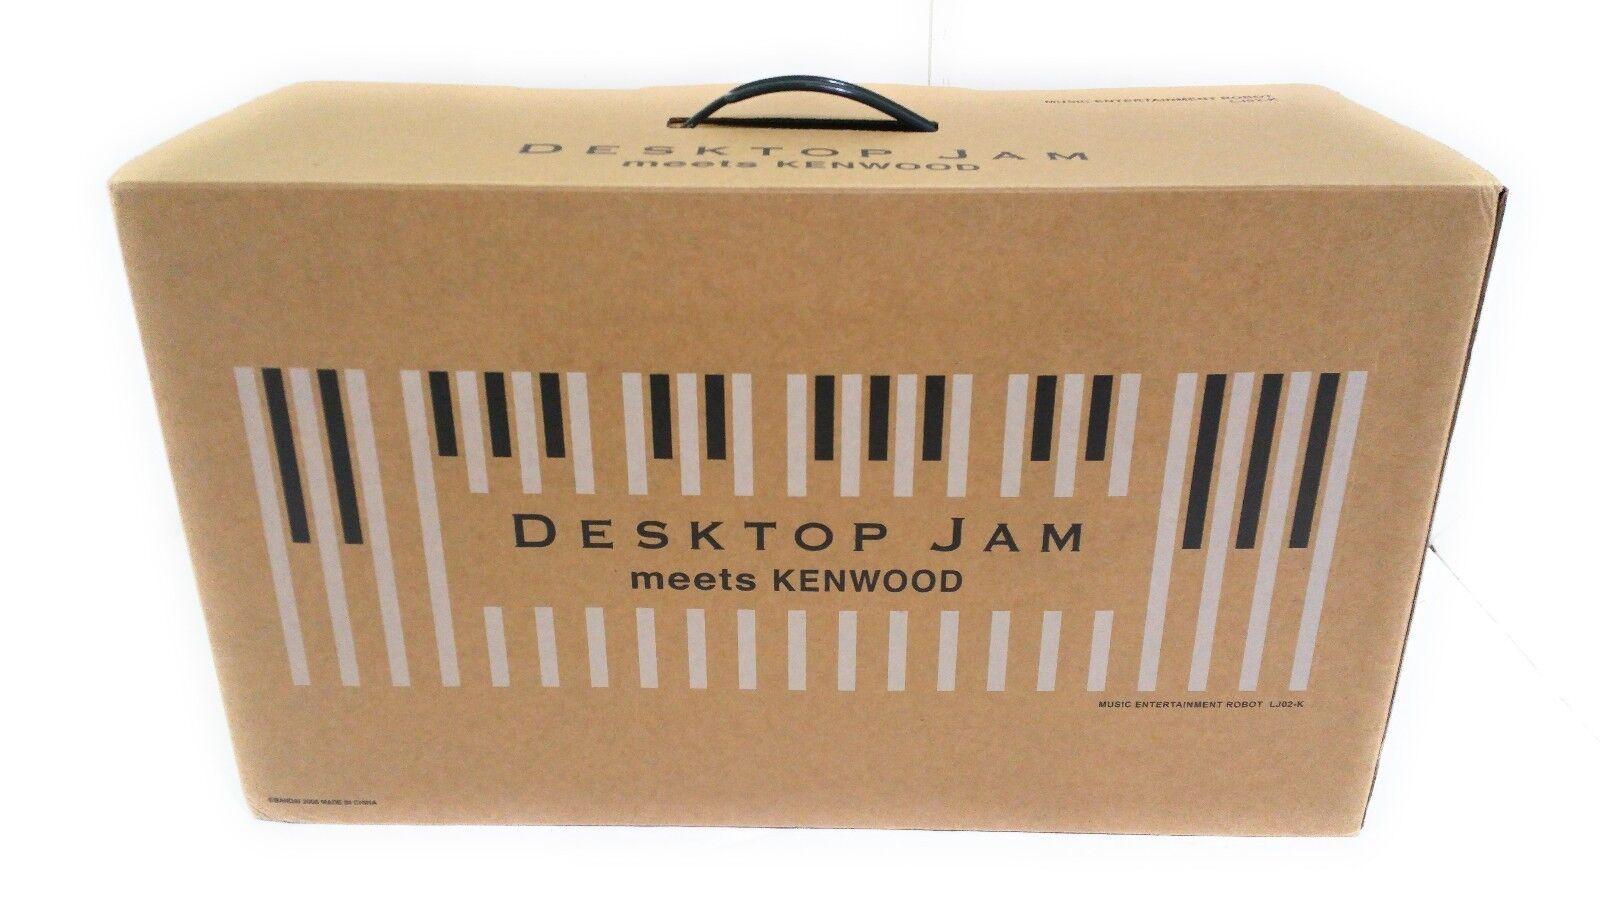 Desktop Jam meets KENWOOD - Entertainment Robot Playing Jazz Music Selection